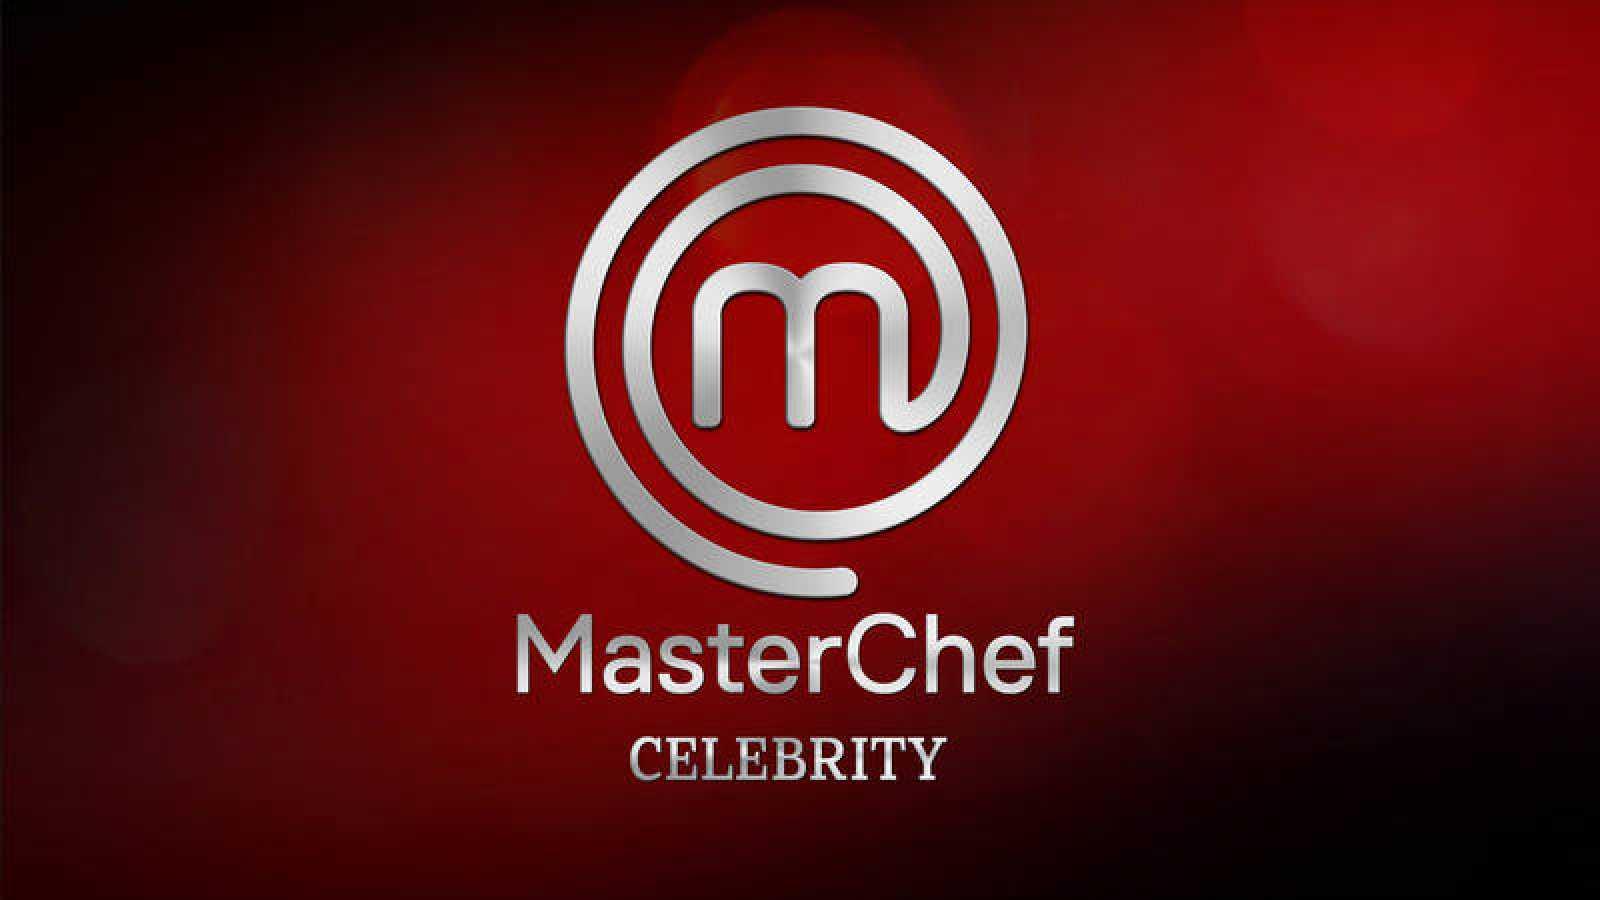 FesTVAl 2019 Master Chef